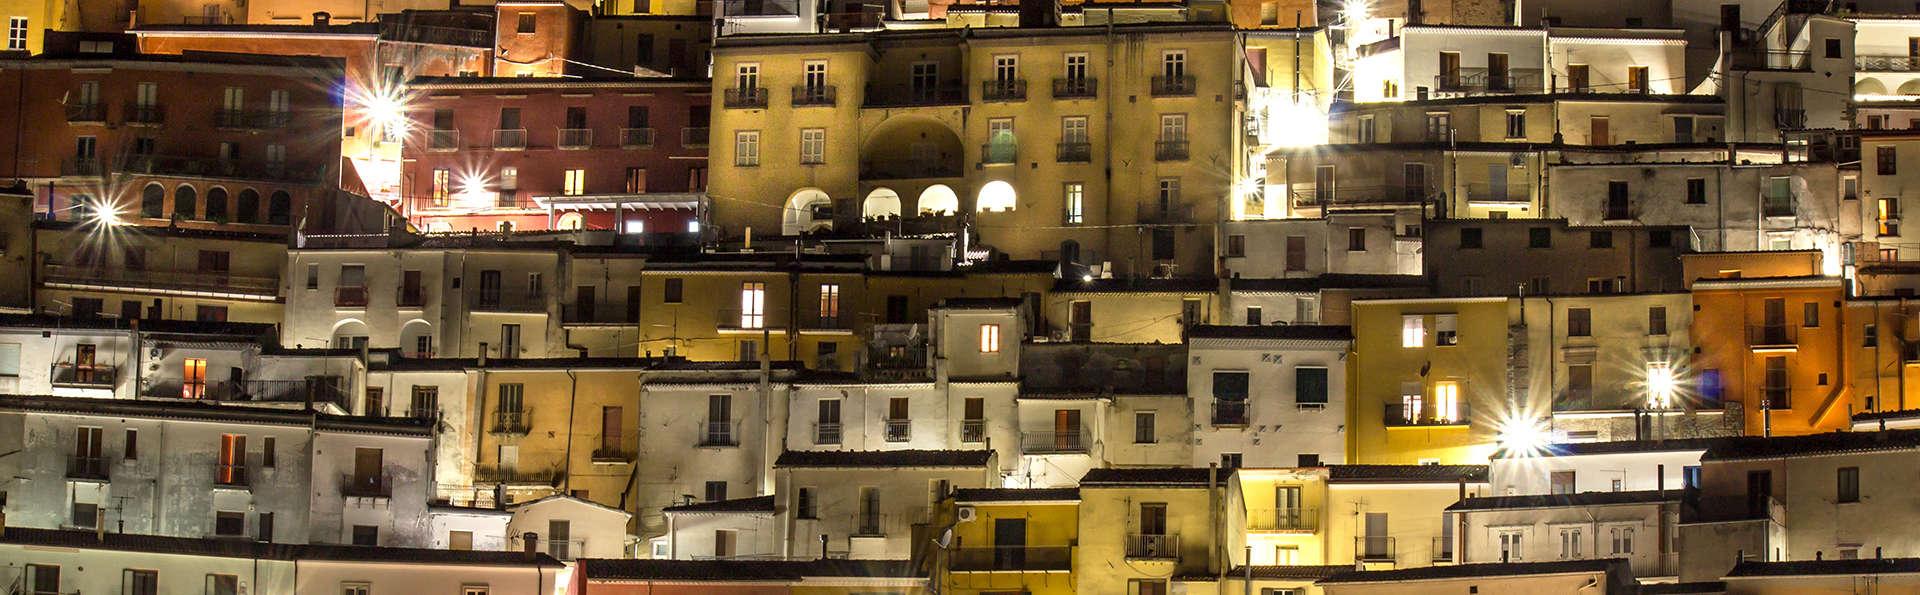 Solofra Palace Hotel - Edit_Avellino2.jpg